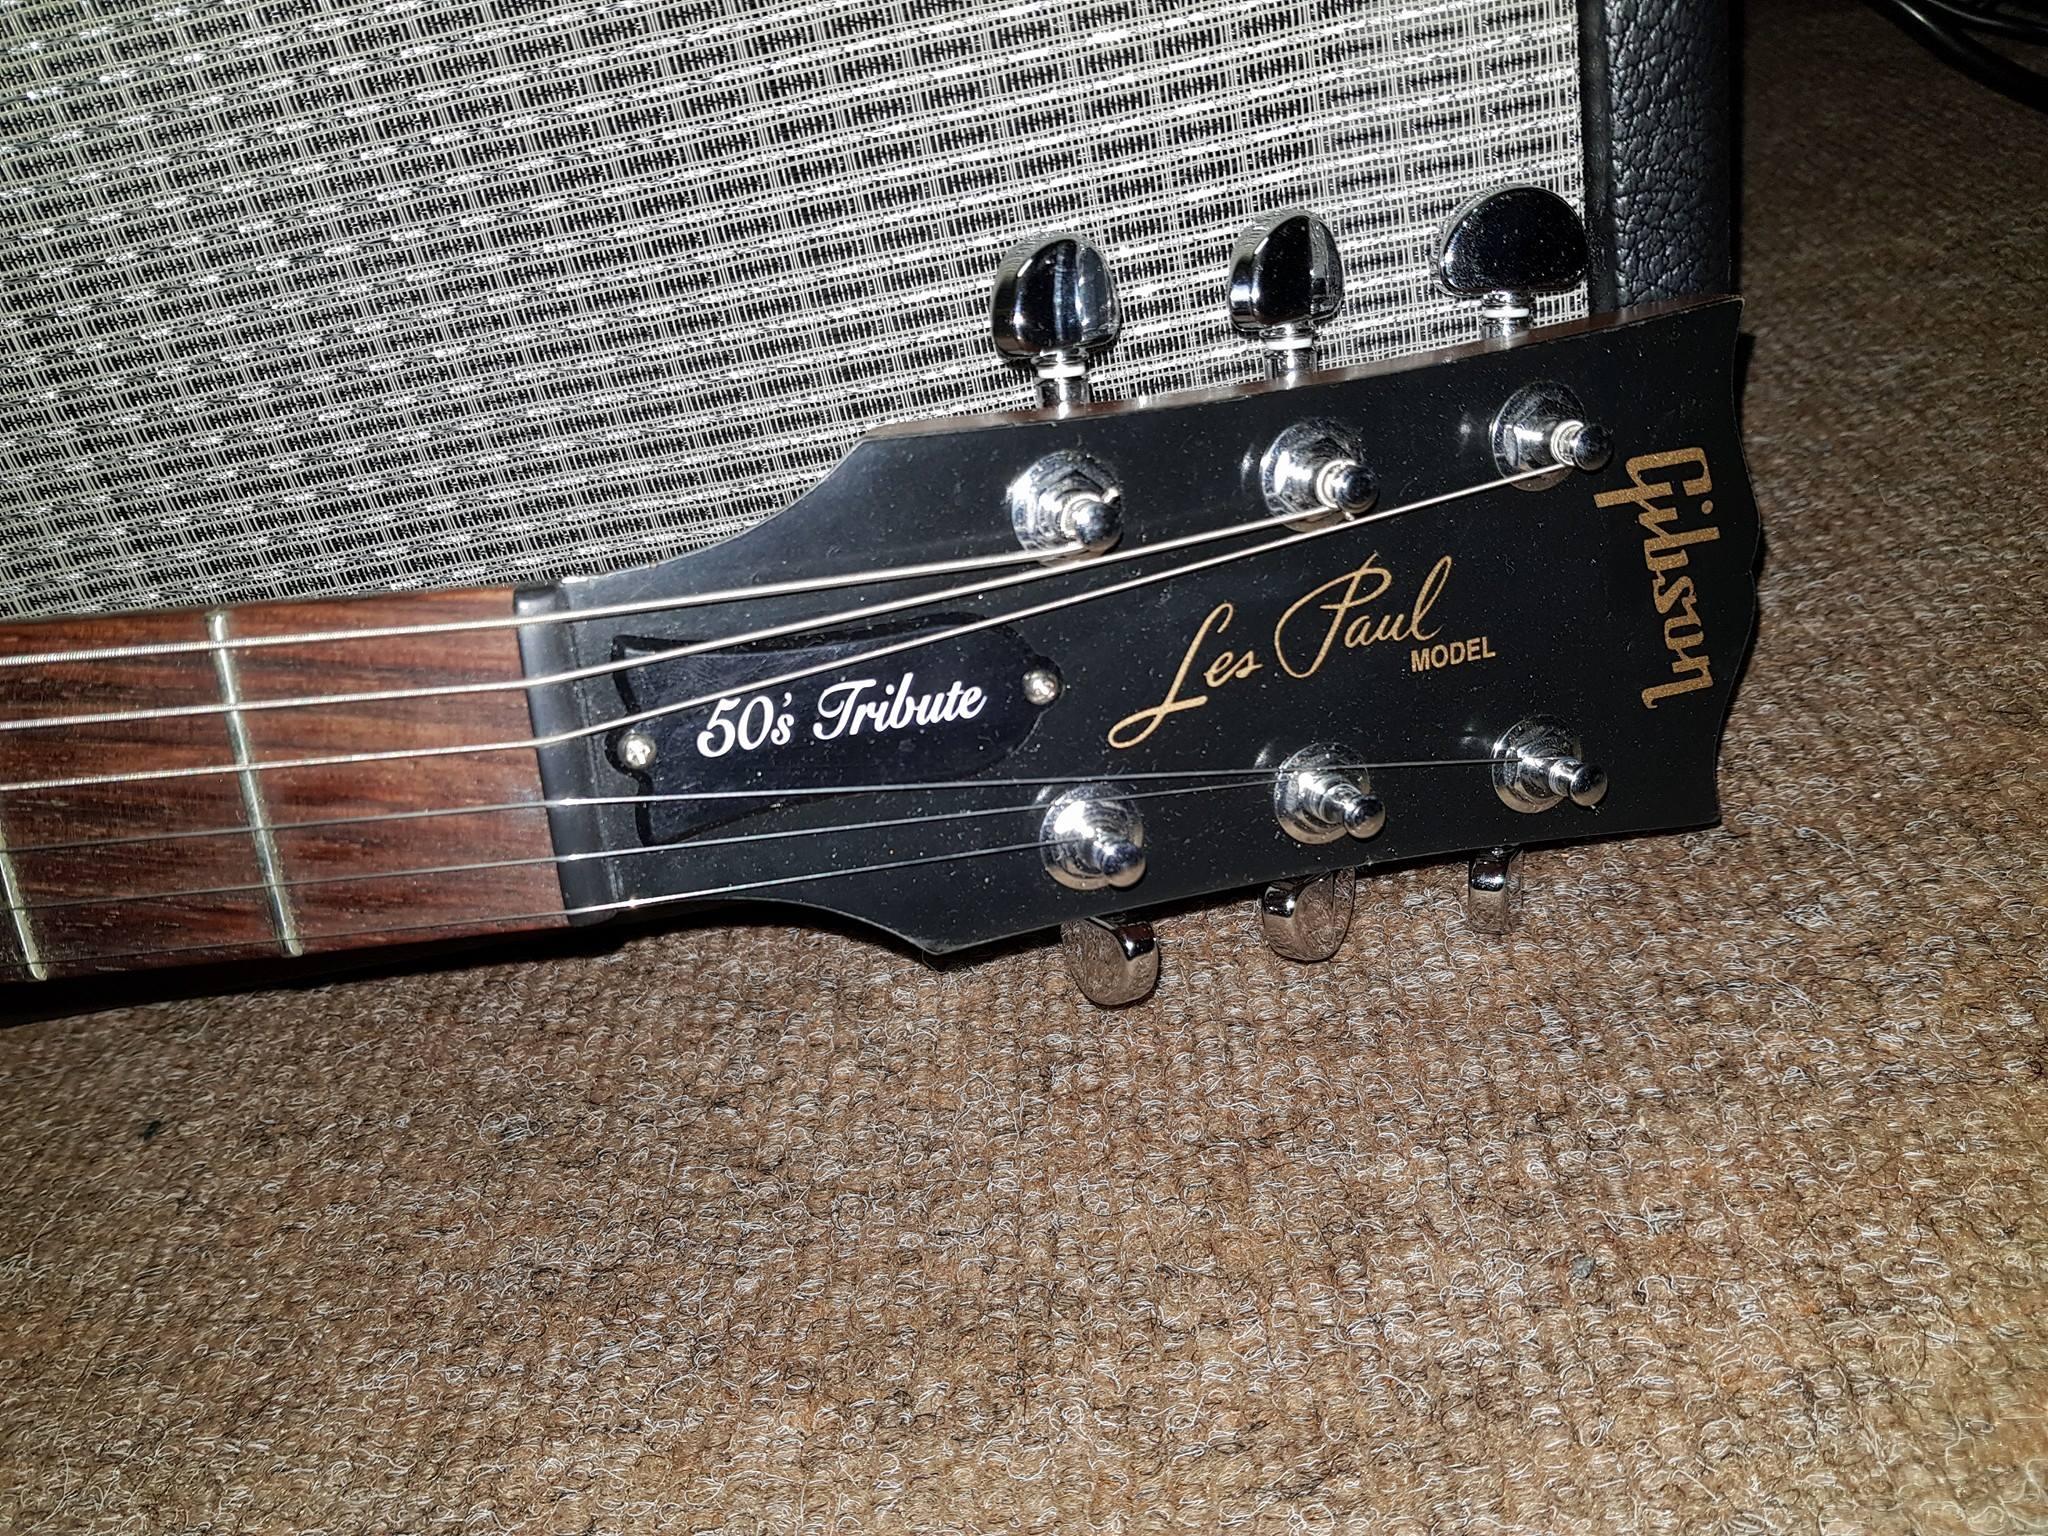 50s Vs Modern Les Paul Honda Odyssey Hitch Wiring Kit 2013 Gibson Standard Diagram Tribute Jimis Music Store 20gibson20les20paul